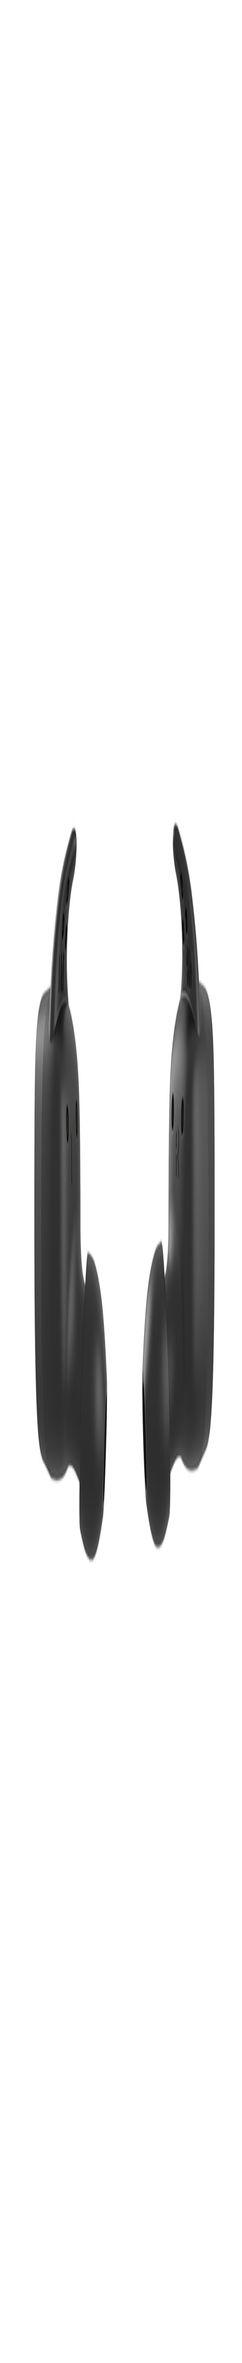 Наушники True Wireless QCY T1 Pro, черные фото